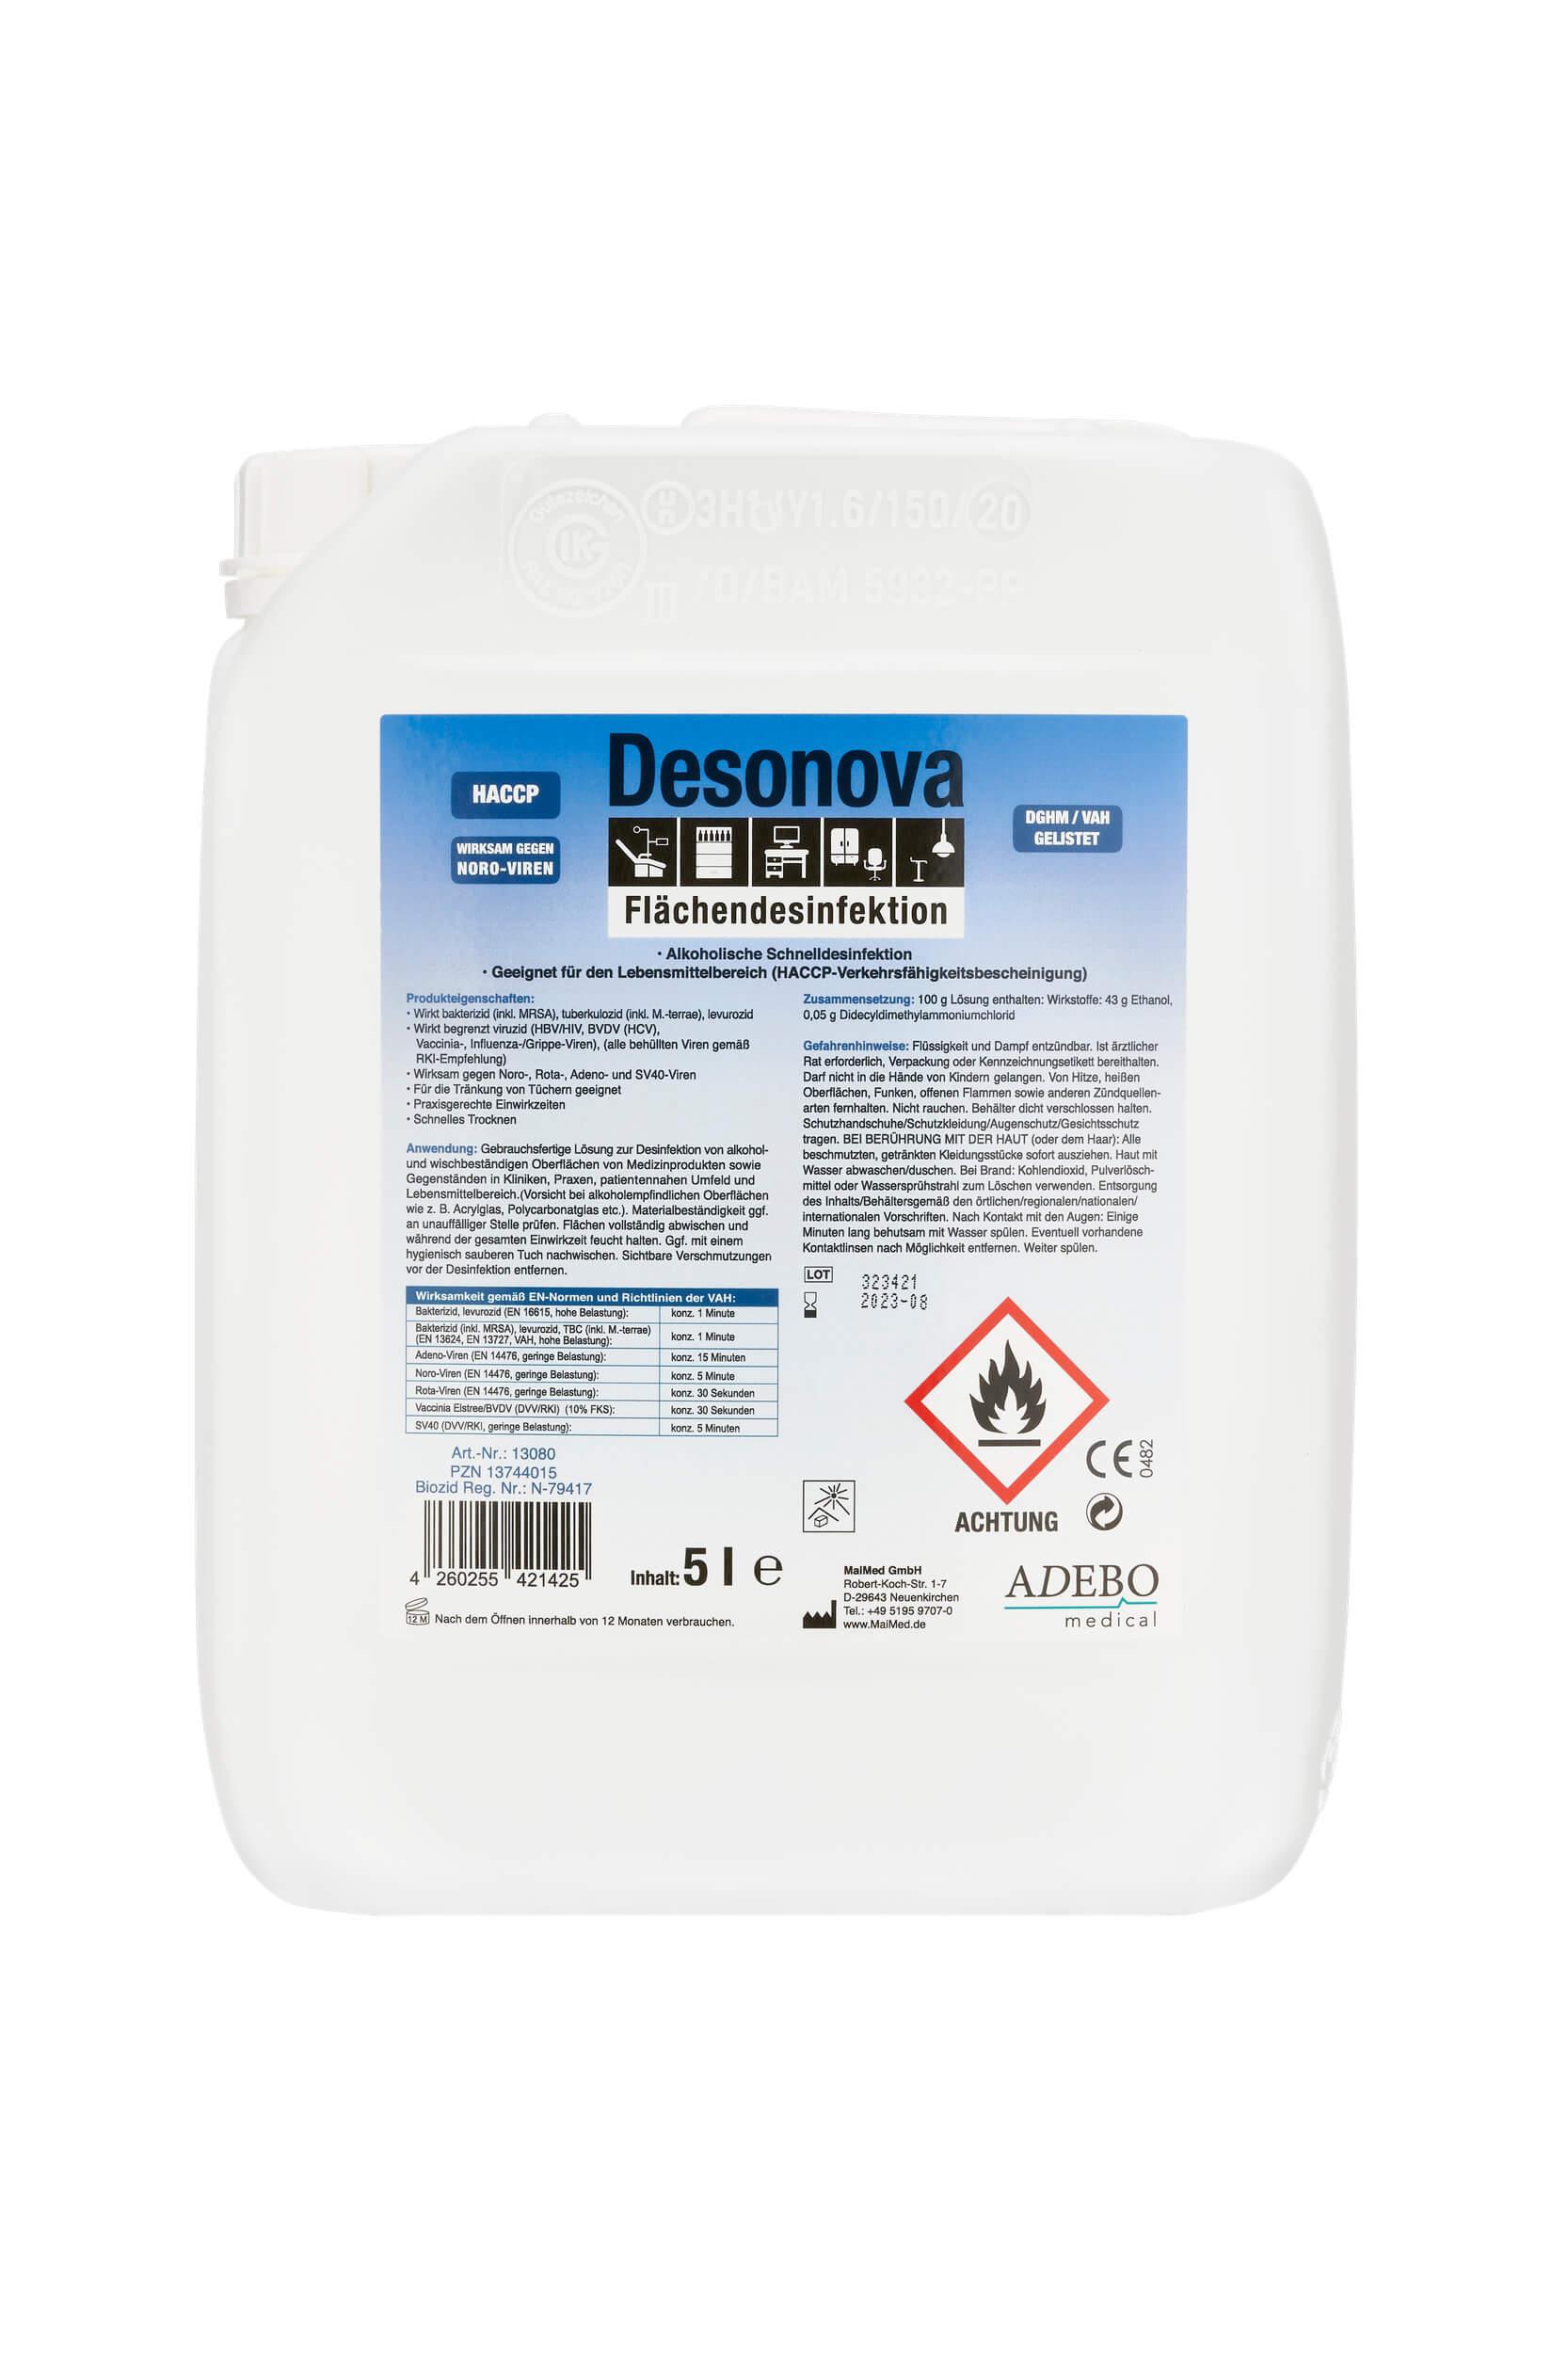 Desonova - Flächendesinfektion